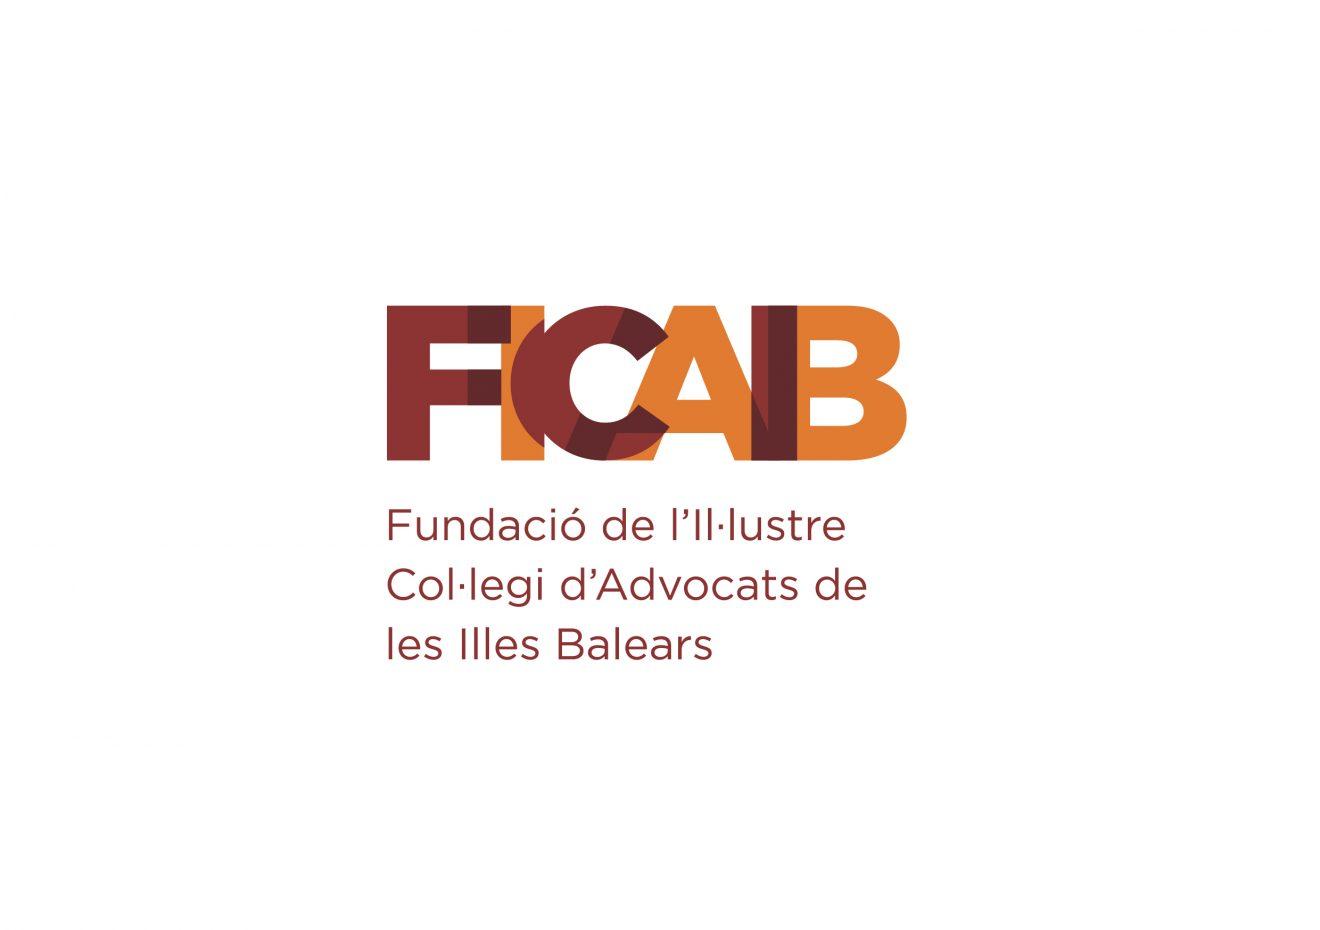 La FPJ se convierte en Fundació de l'Il·lustre Col·legi d'Advocats de les Illes Balears